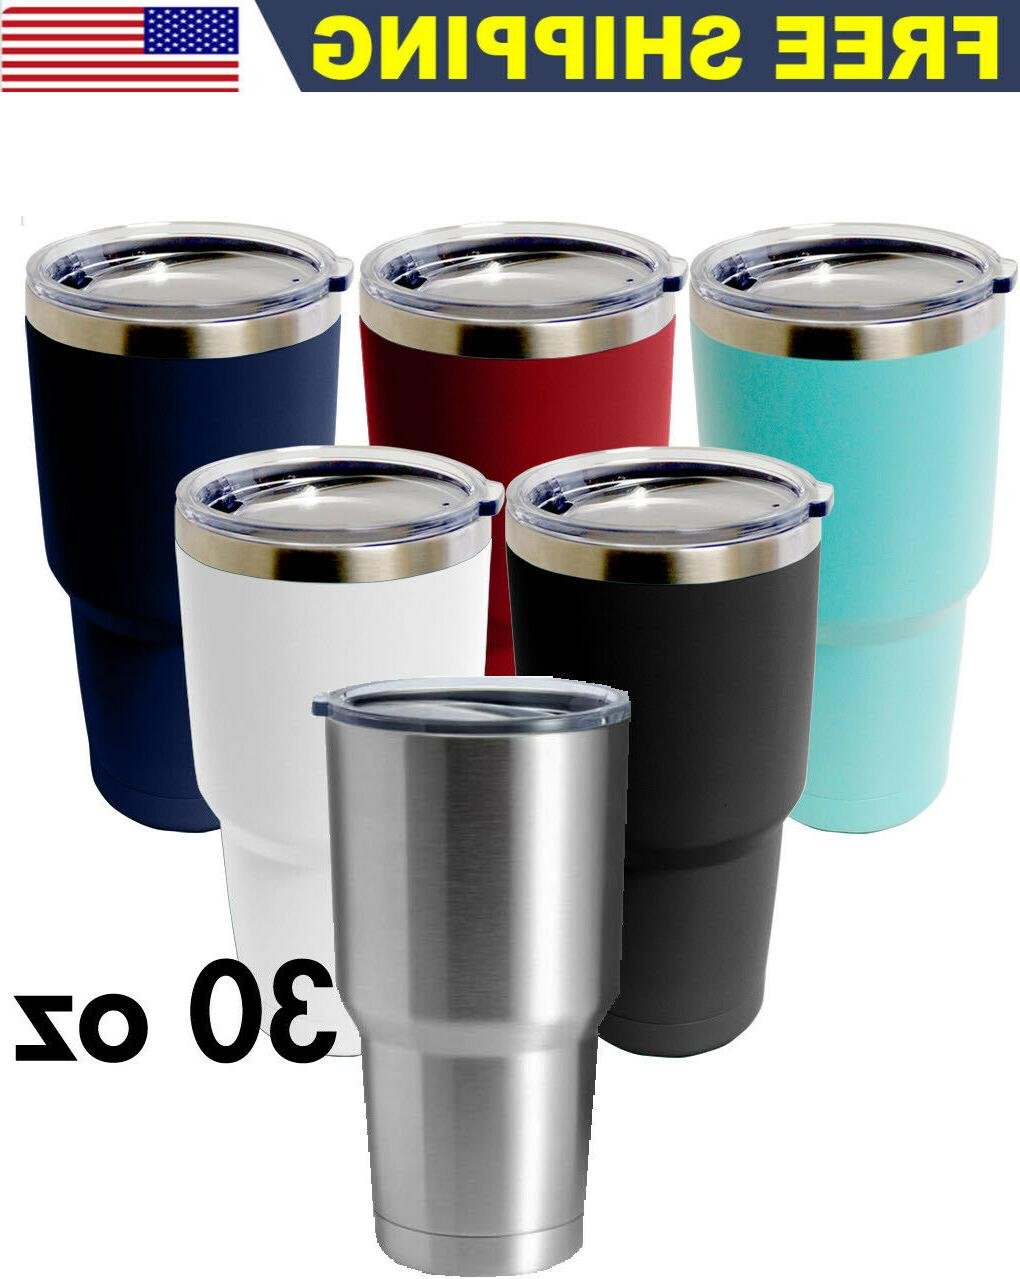 30 oz stainless steel tumbler vacuum double